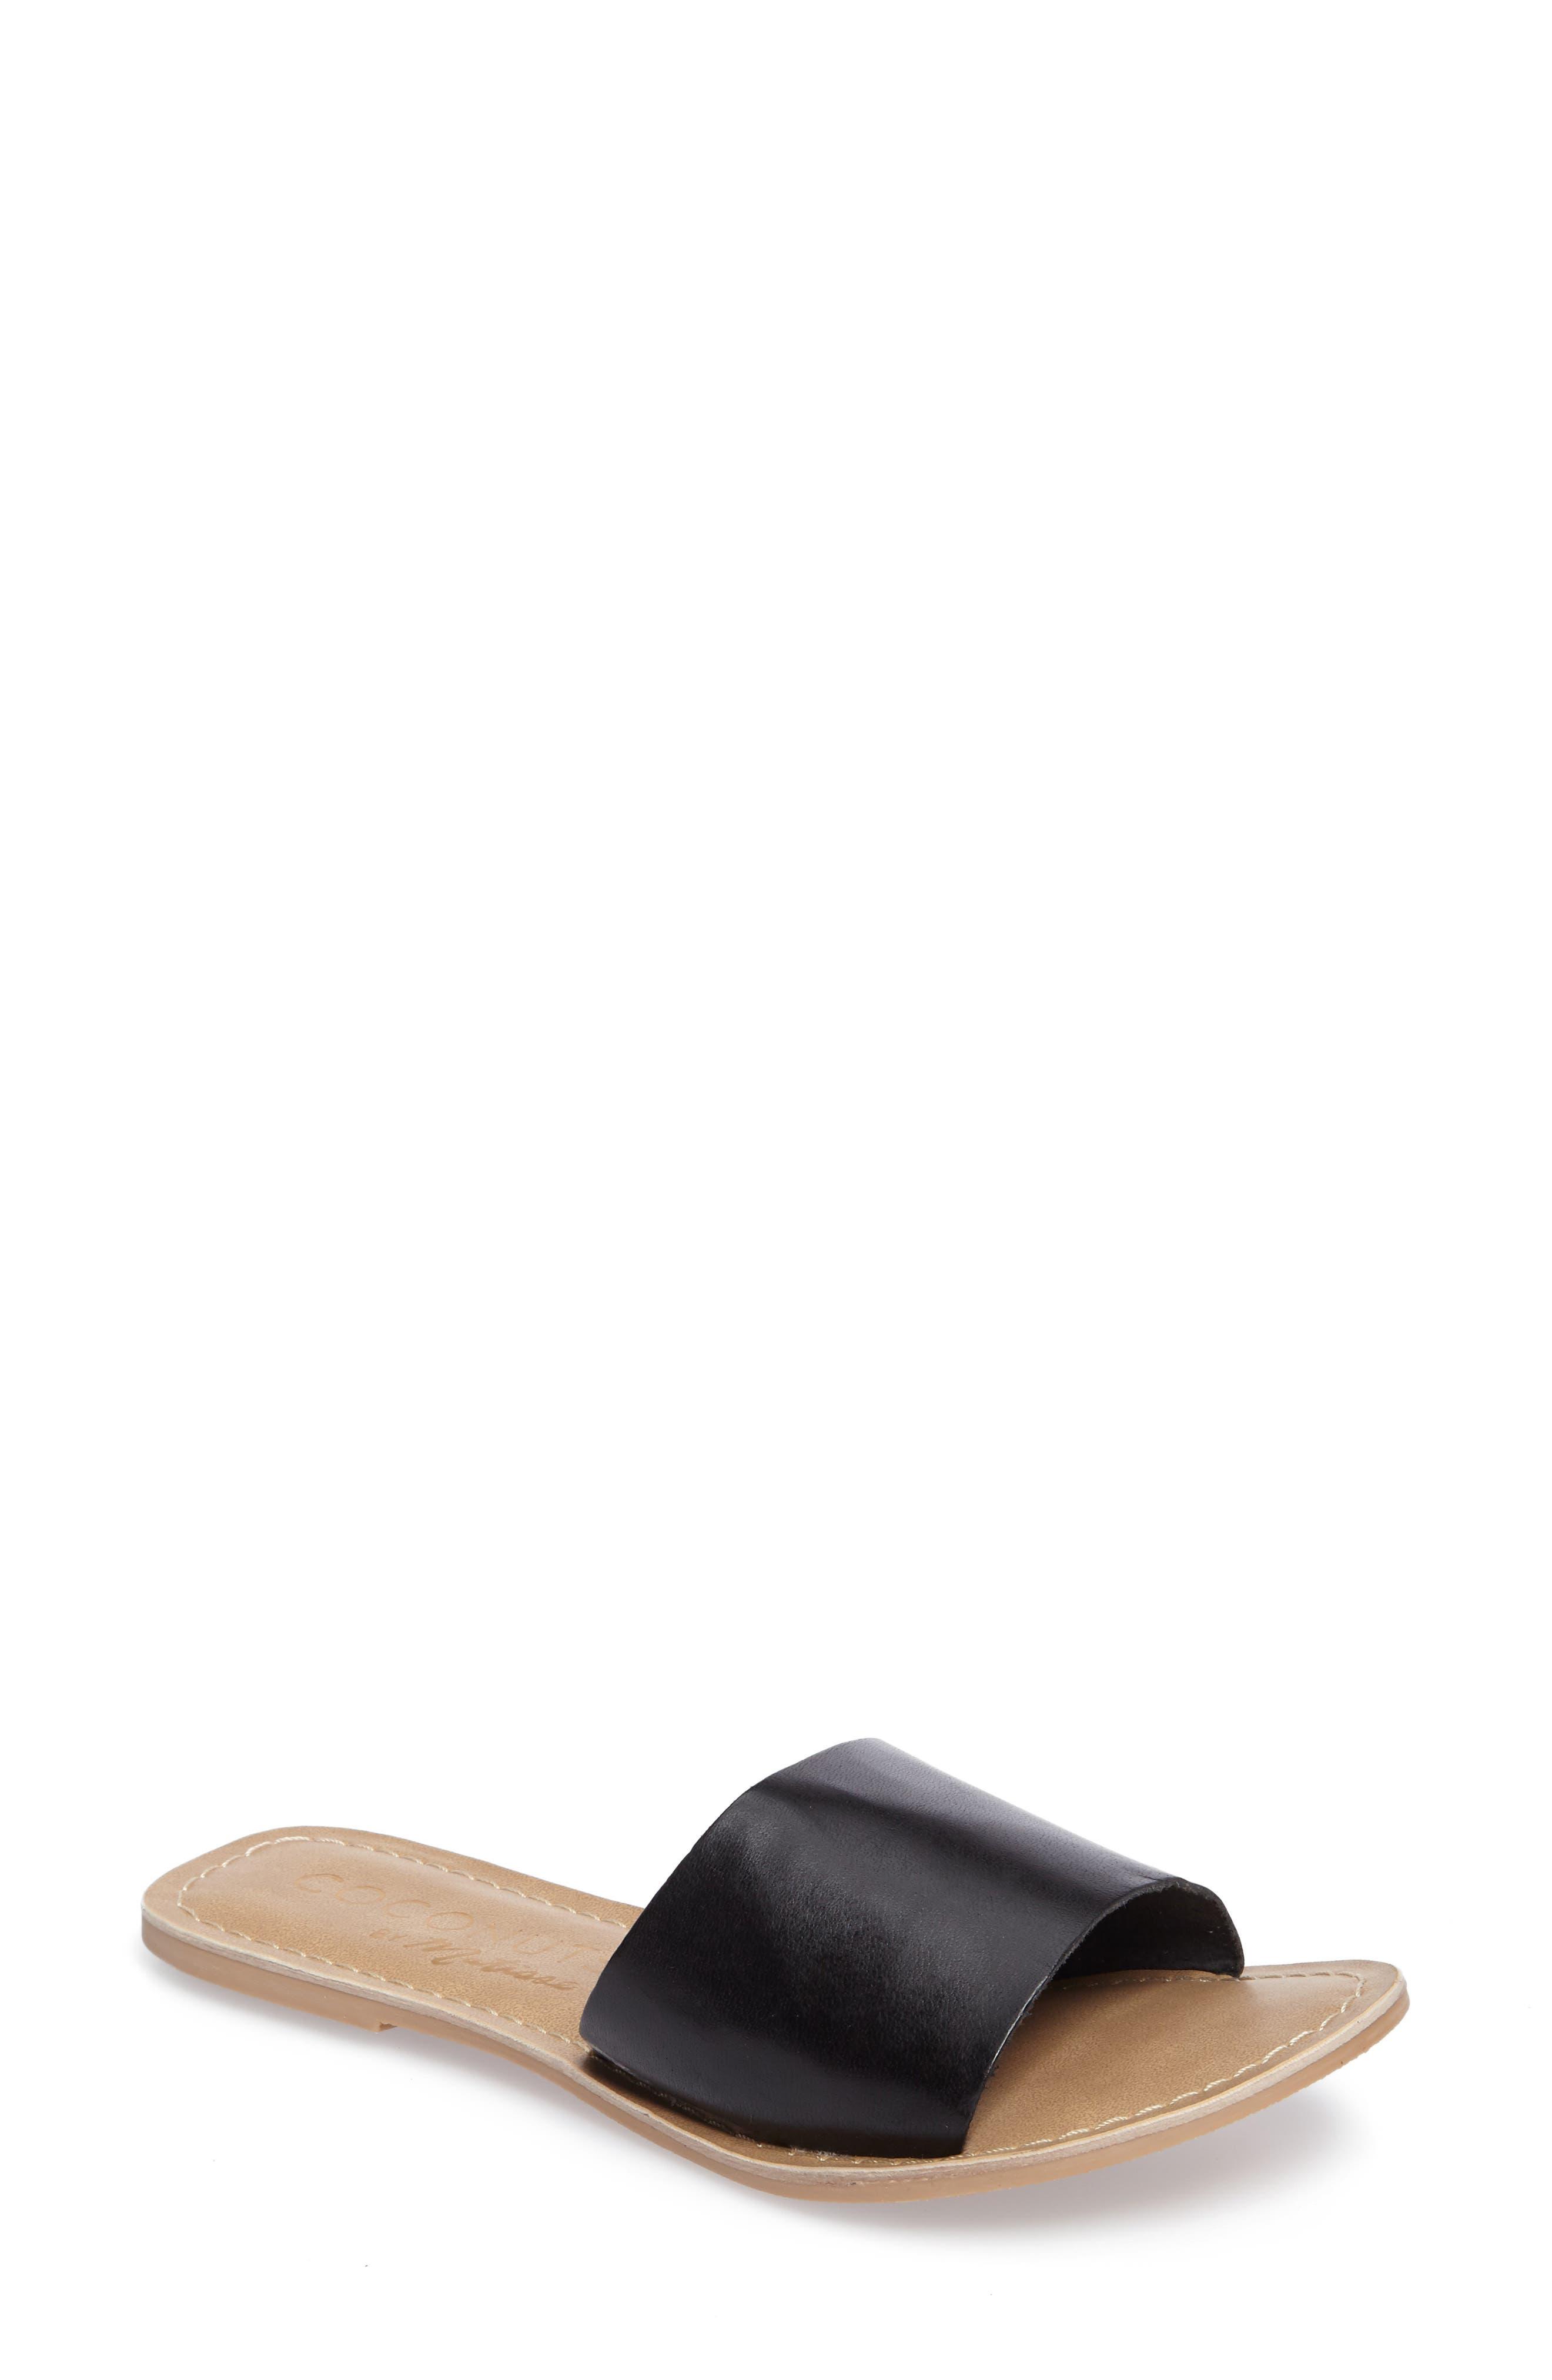 COCONUTS BY MATISSE, Cabana Genuine Calf Hair Slide Sandal, Main thumbnail 1, color, 001